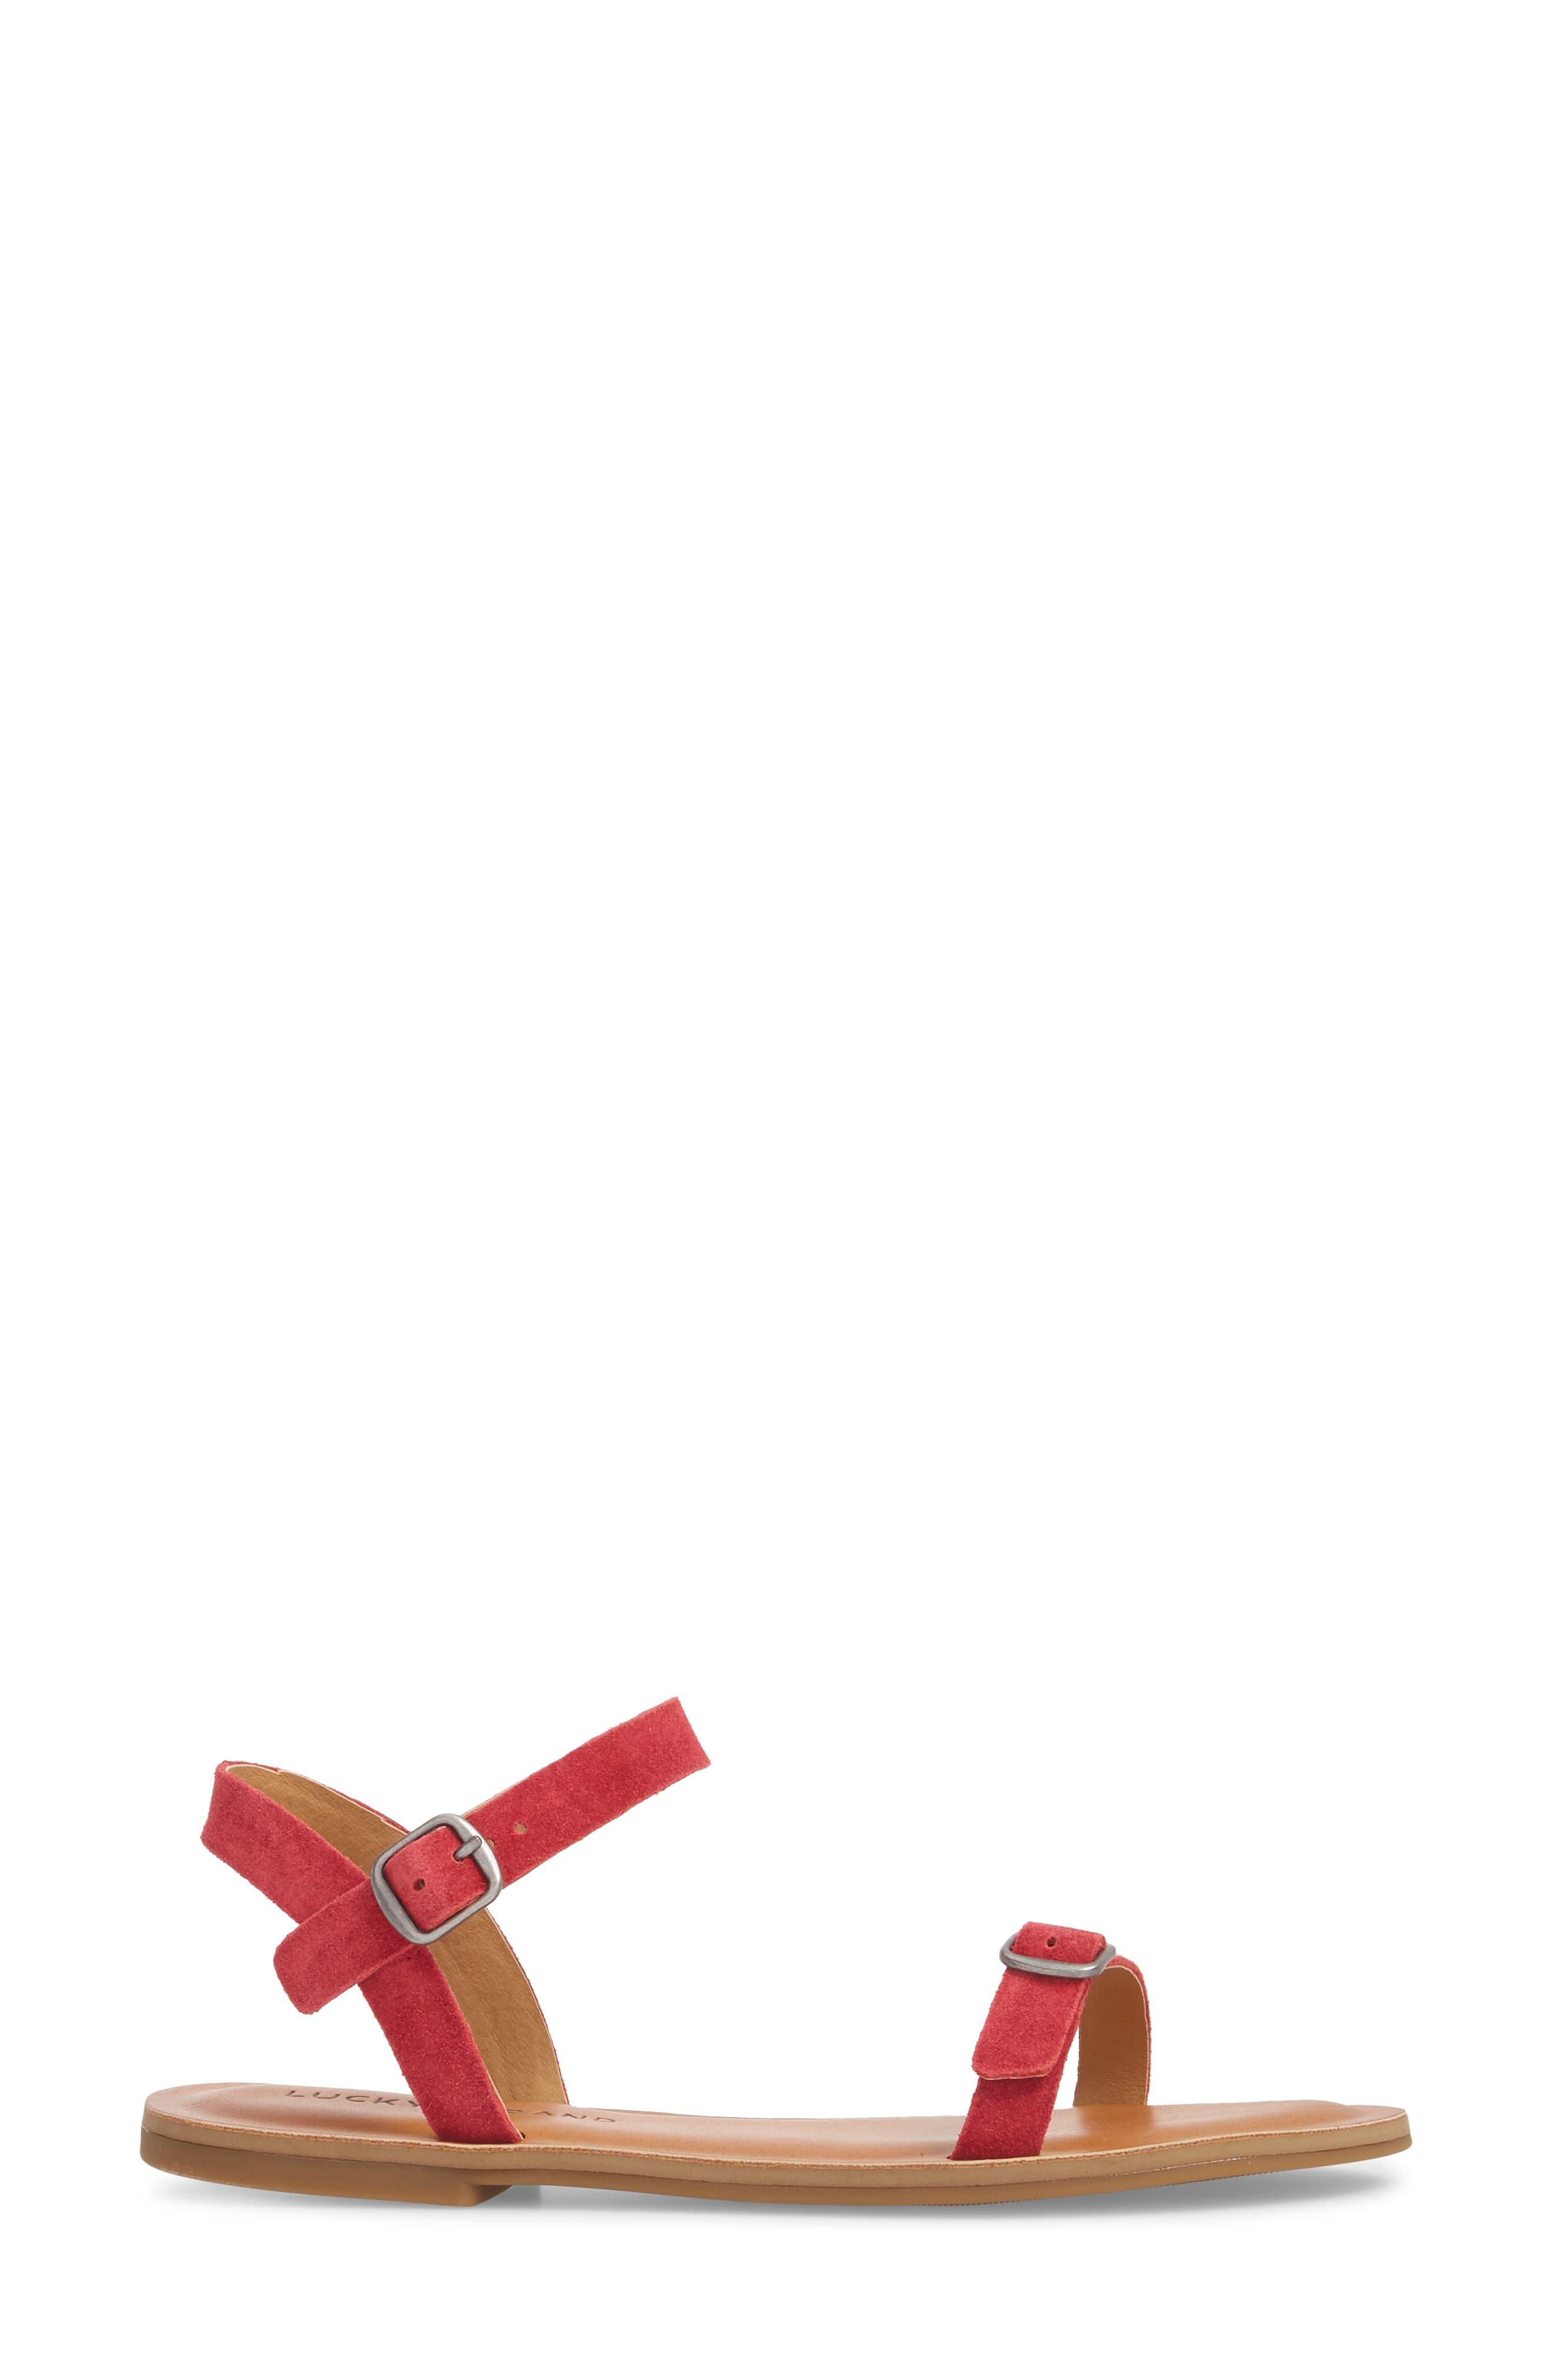 Adymaris Sandal,                             Alternate thumbnail 3, color,                             SB RED SUEDE